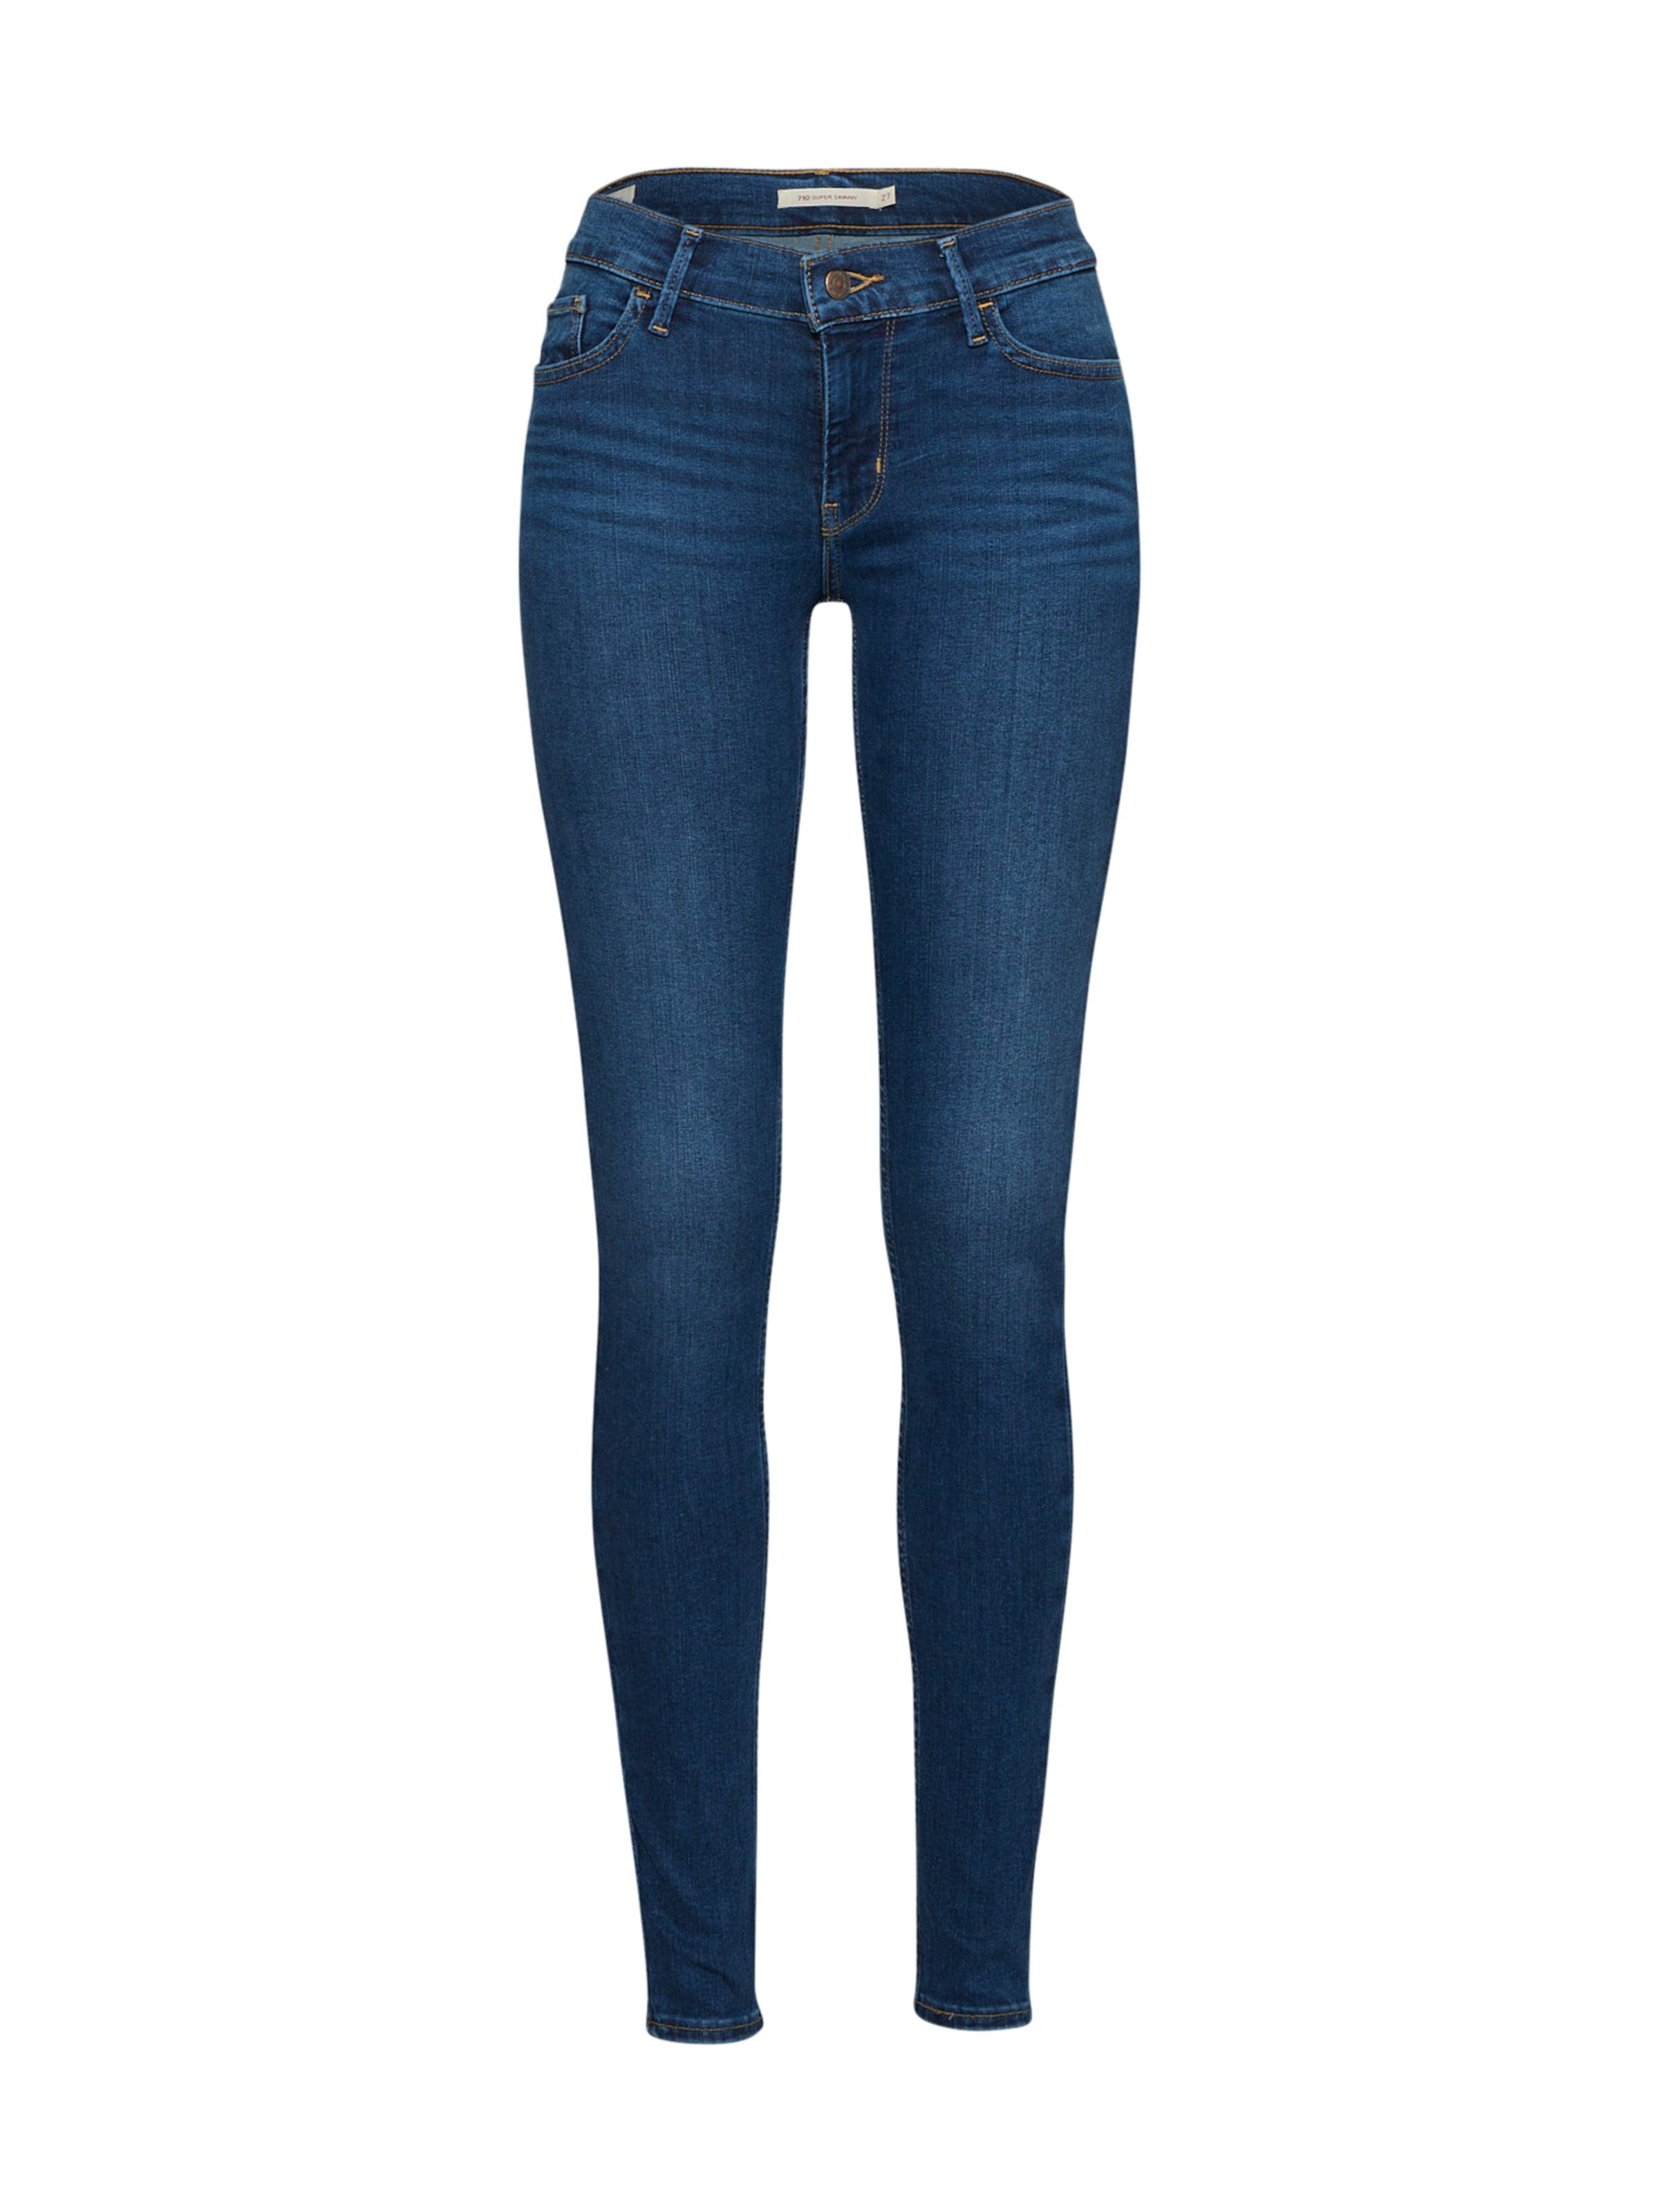 '710 In Jeans Blauw Denim Innovation Skinny' Levi's Super GqUMpSzV